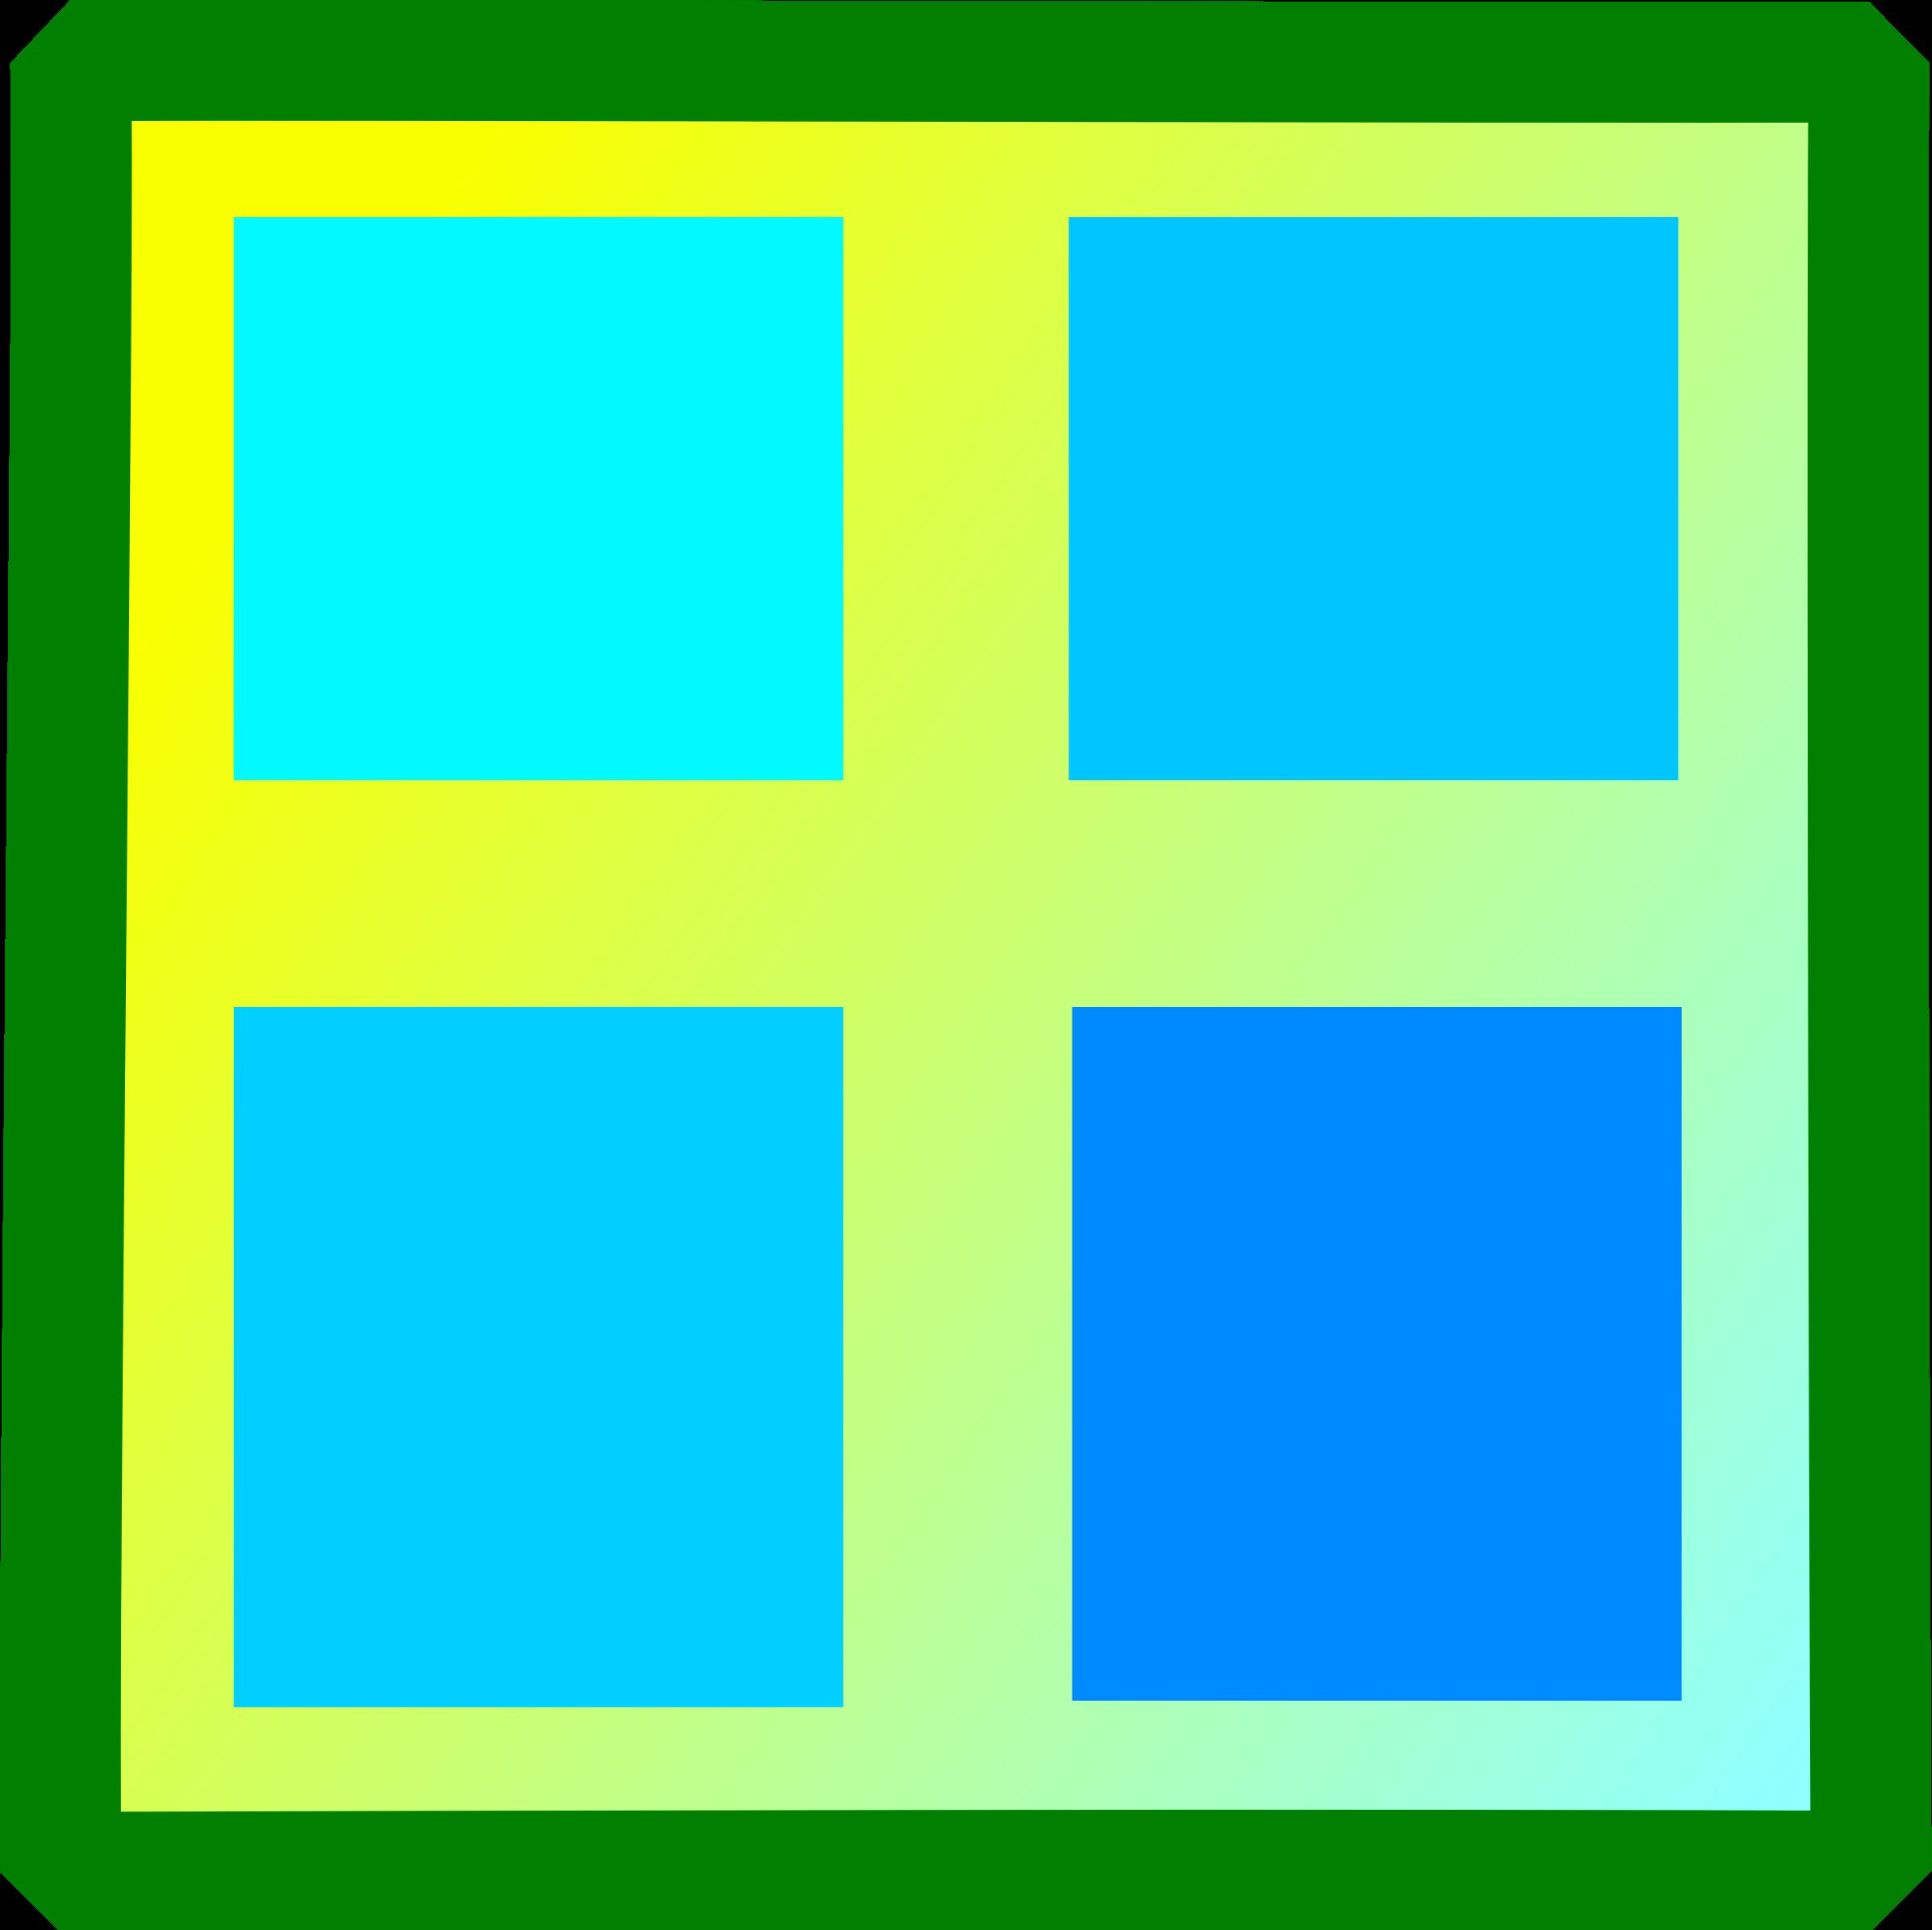 Square clipart teal Cliparts Window Square Clip Free